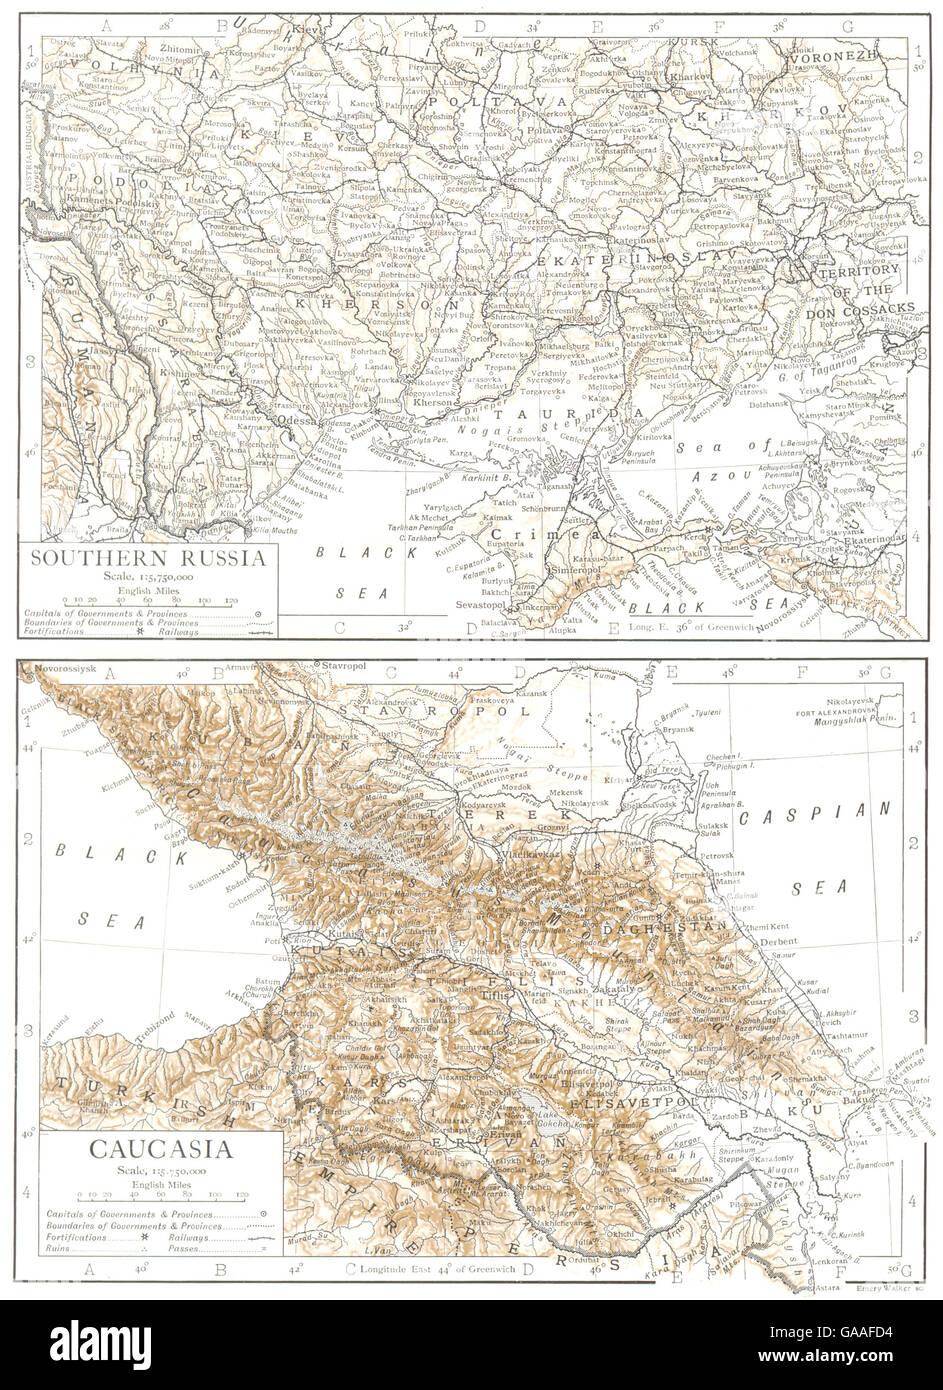 Map Of Georgia Southern.Ukraine Caucasia Georgia Southern Russia Azerbaijan 1910 Antique